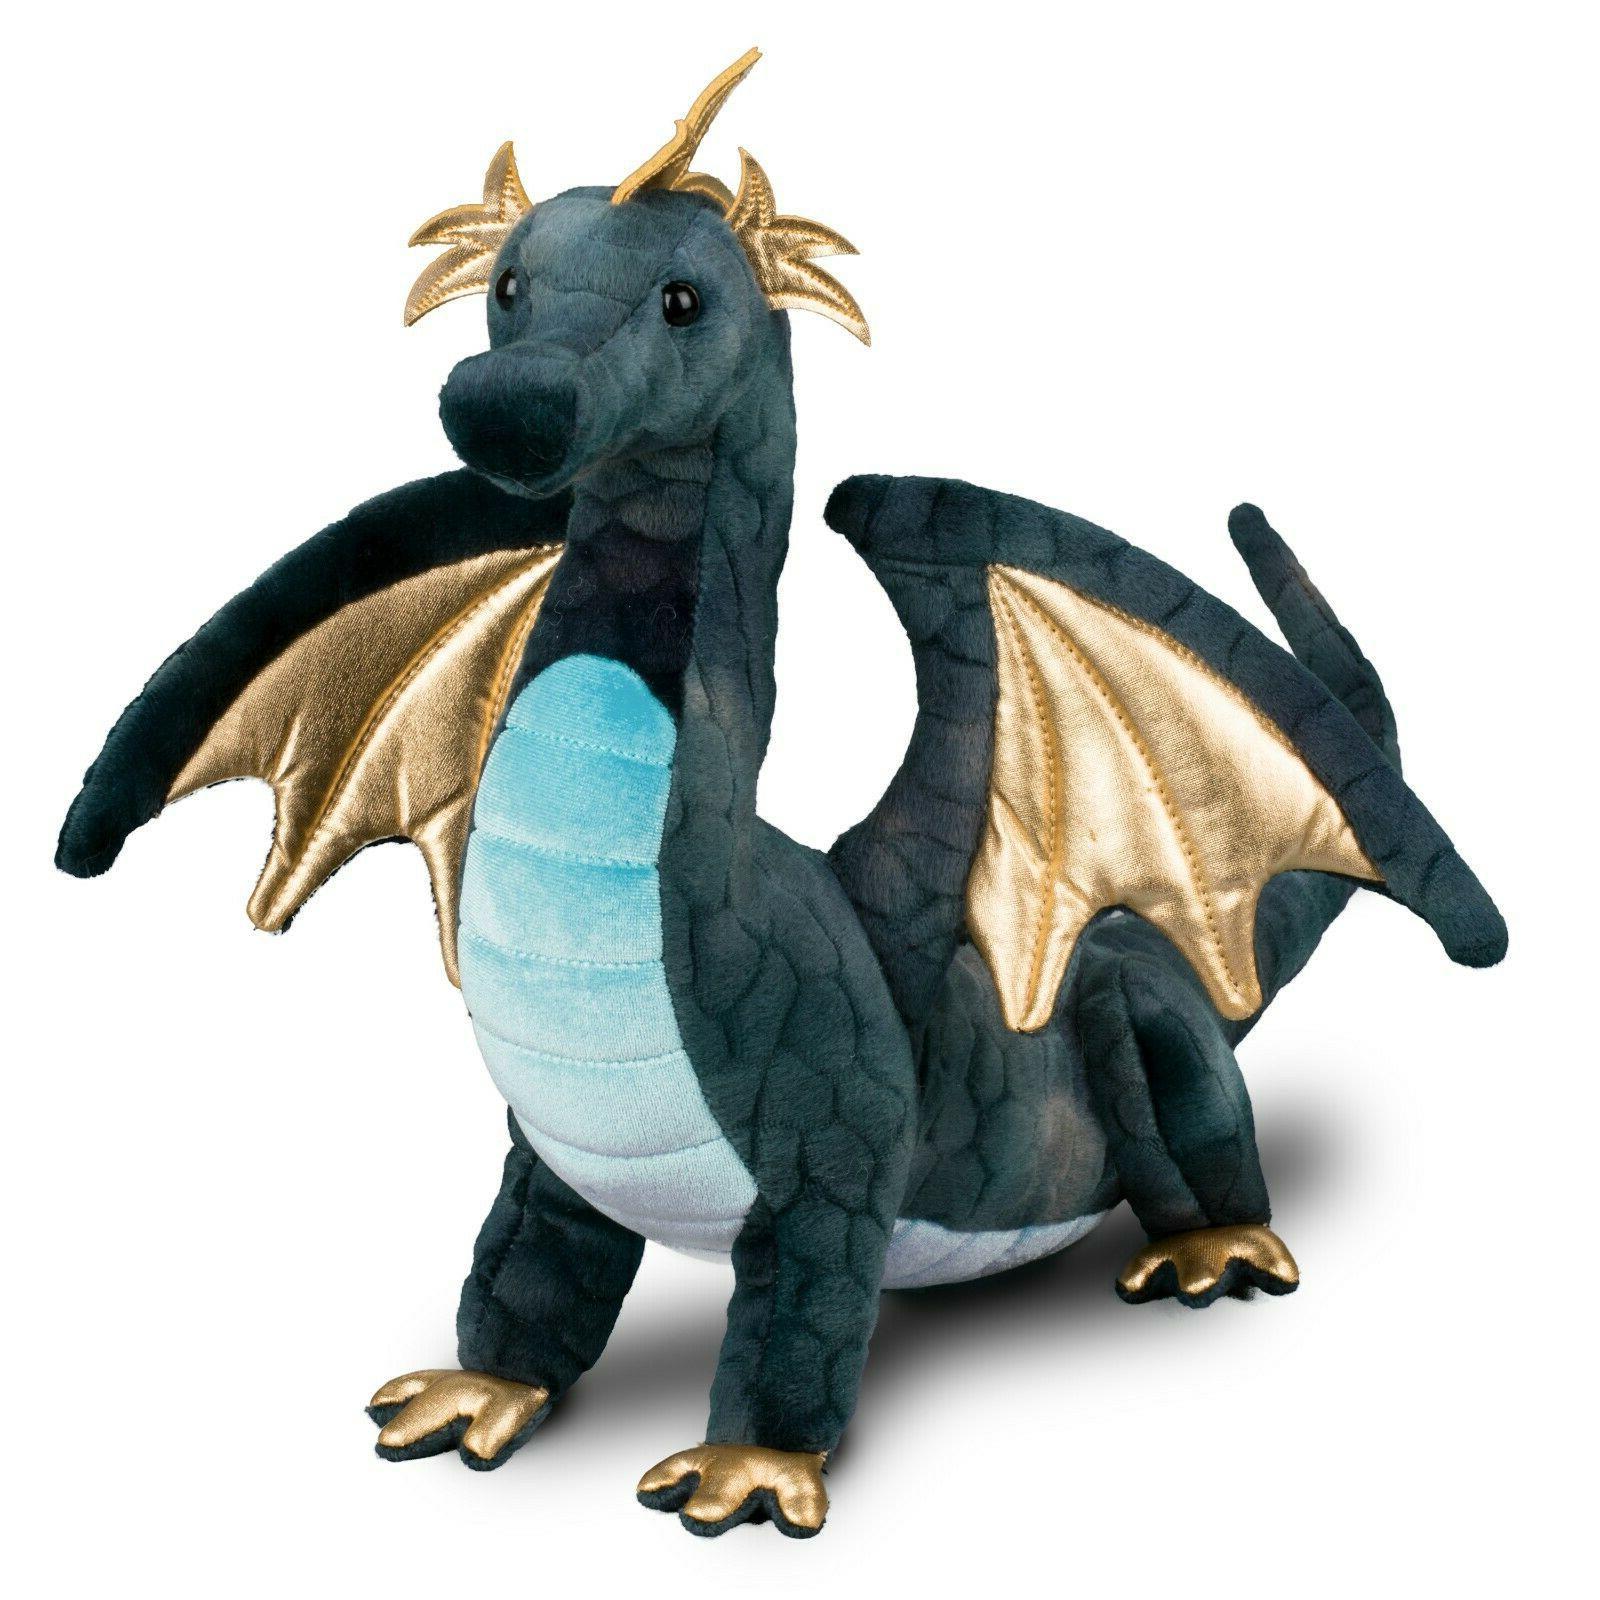 aragon blue dragon plush stuffed